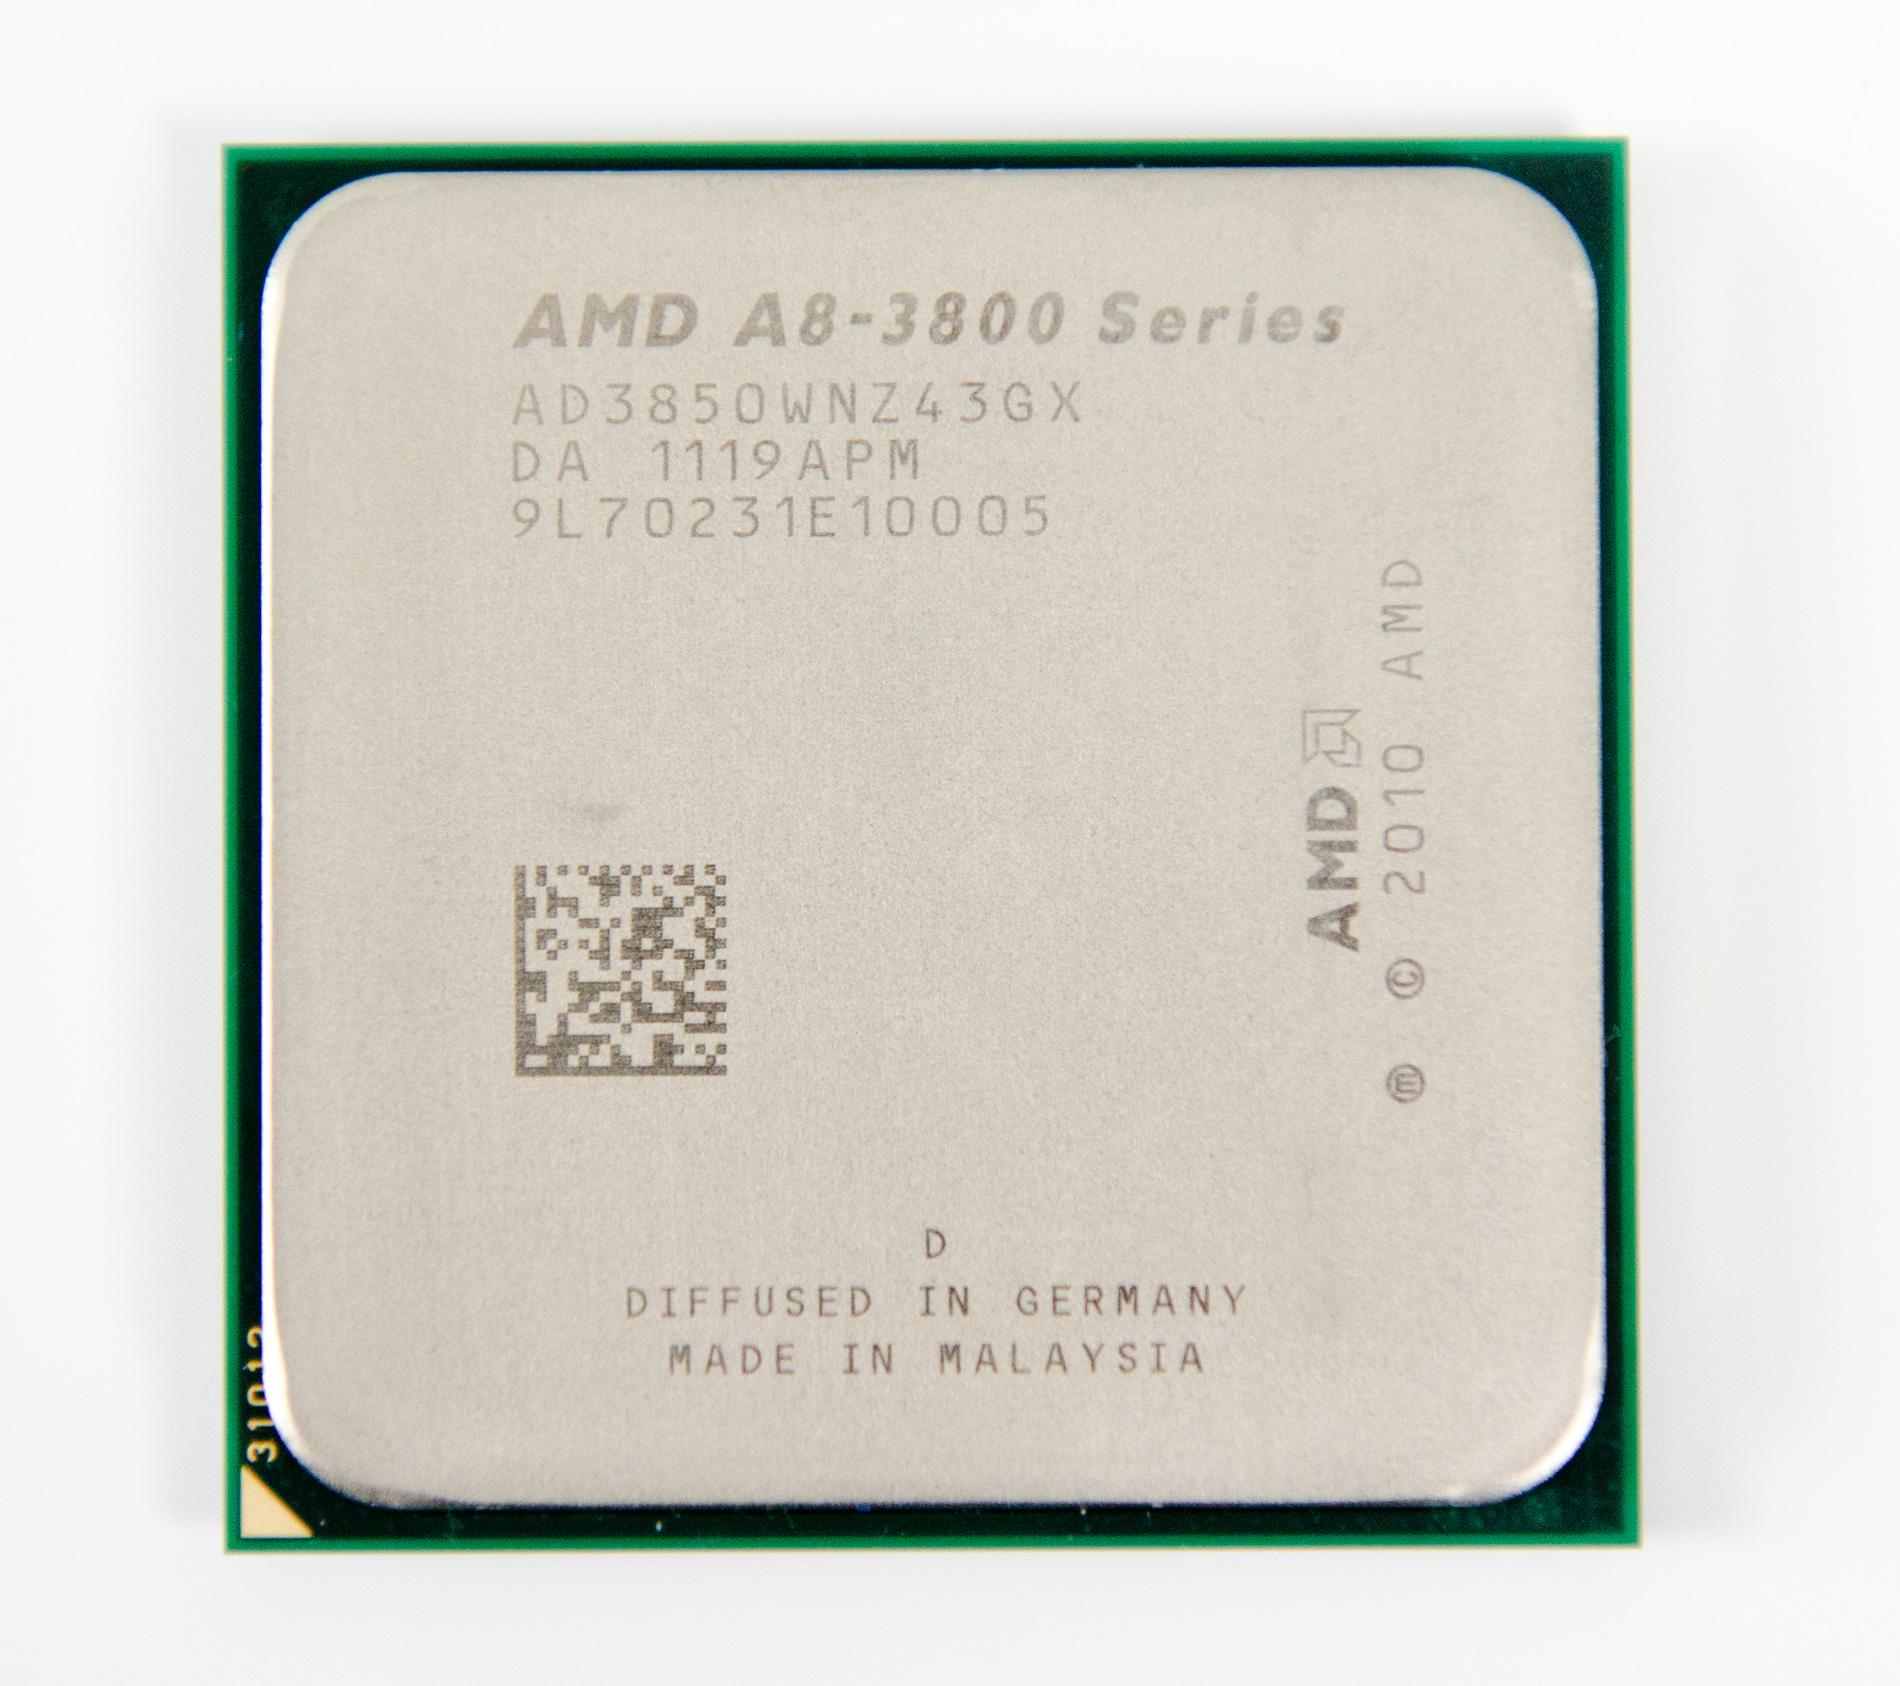 Final Words - The Llano Desktop Preview: AMD A8-3850 CPU & GPU